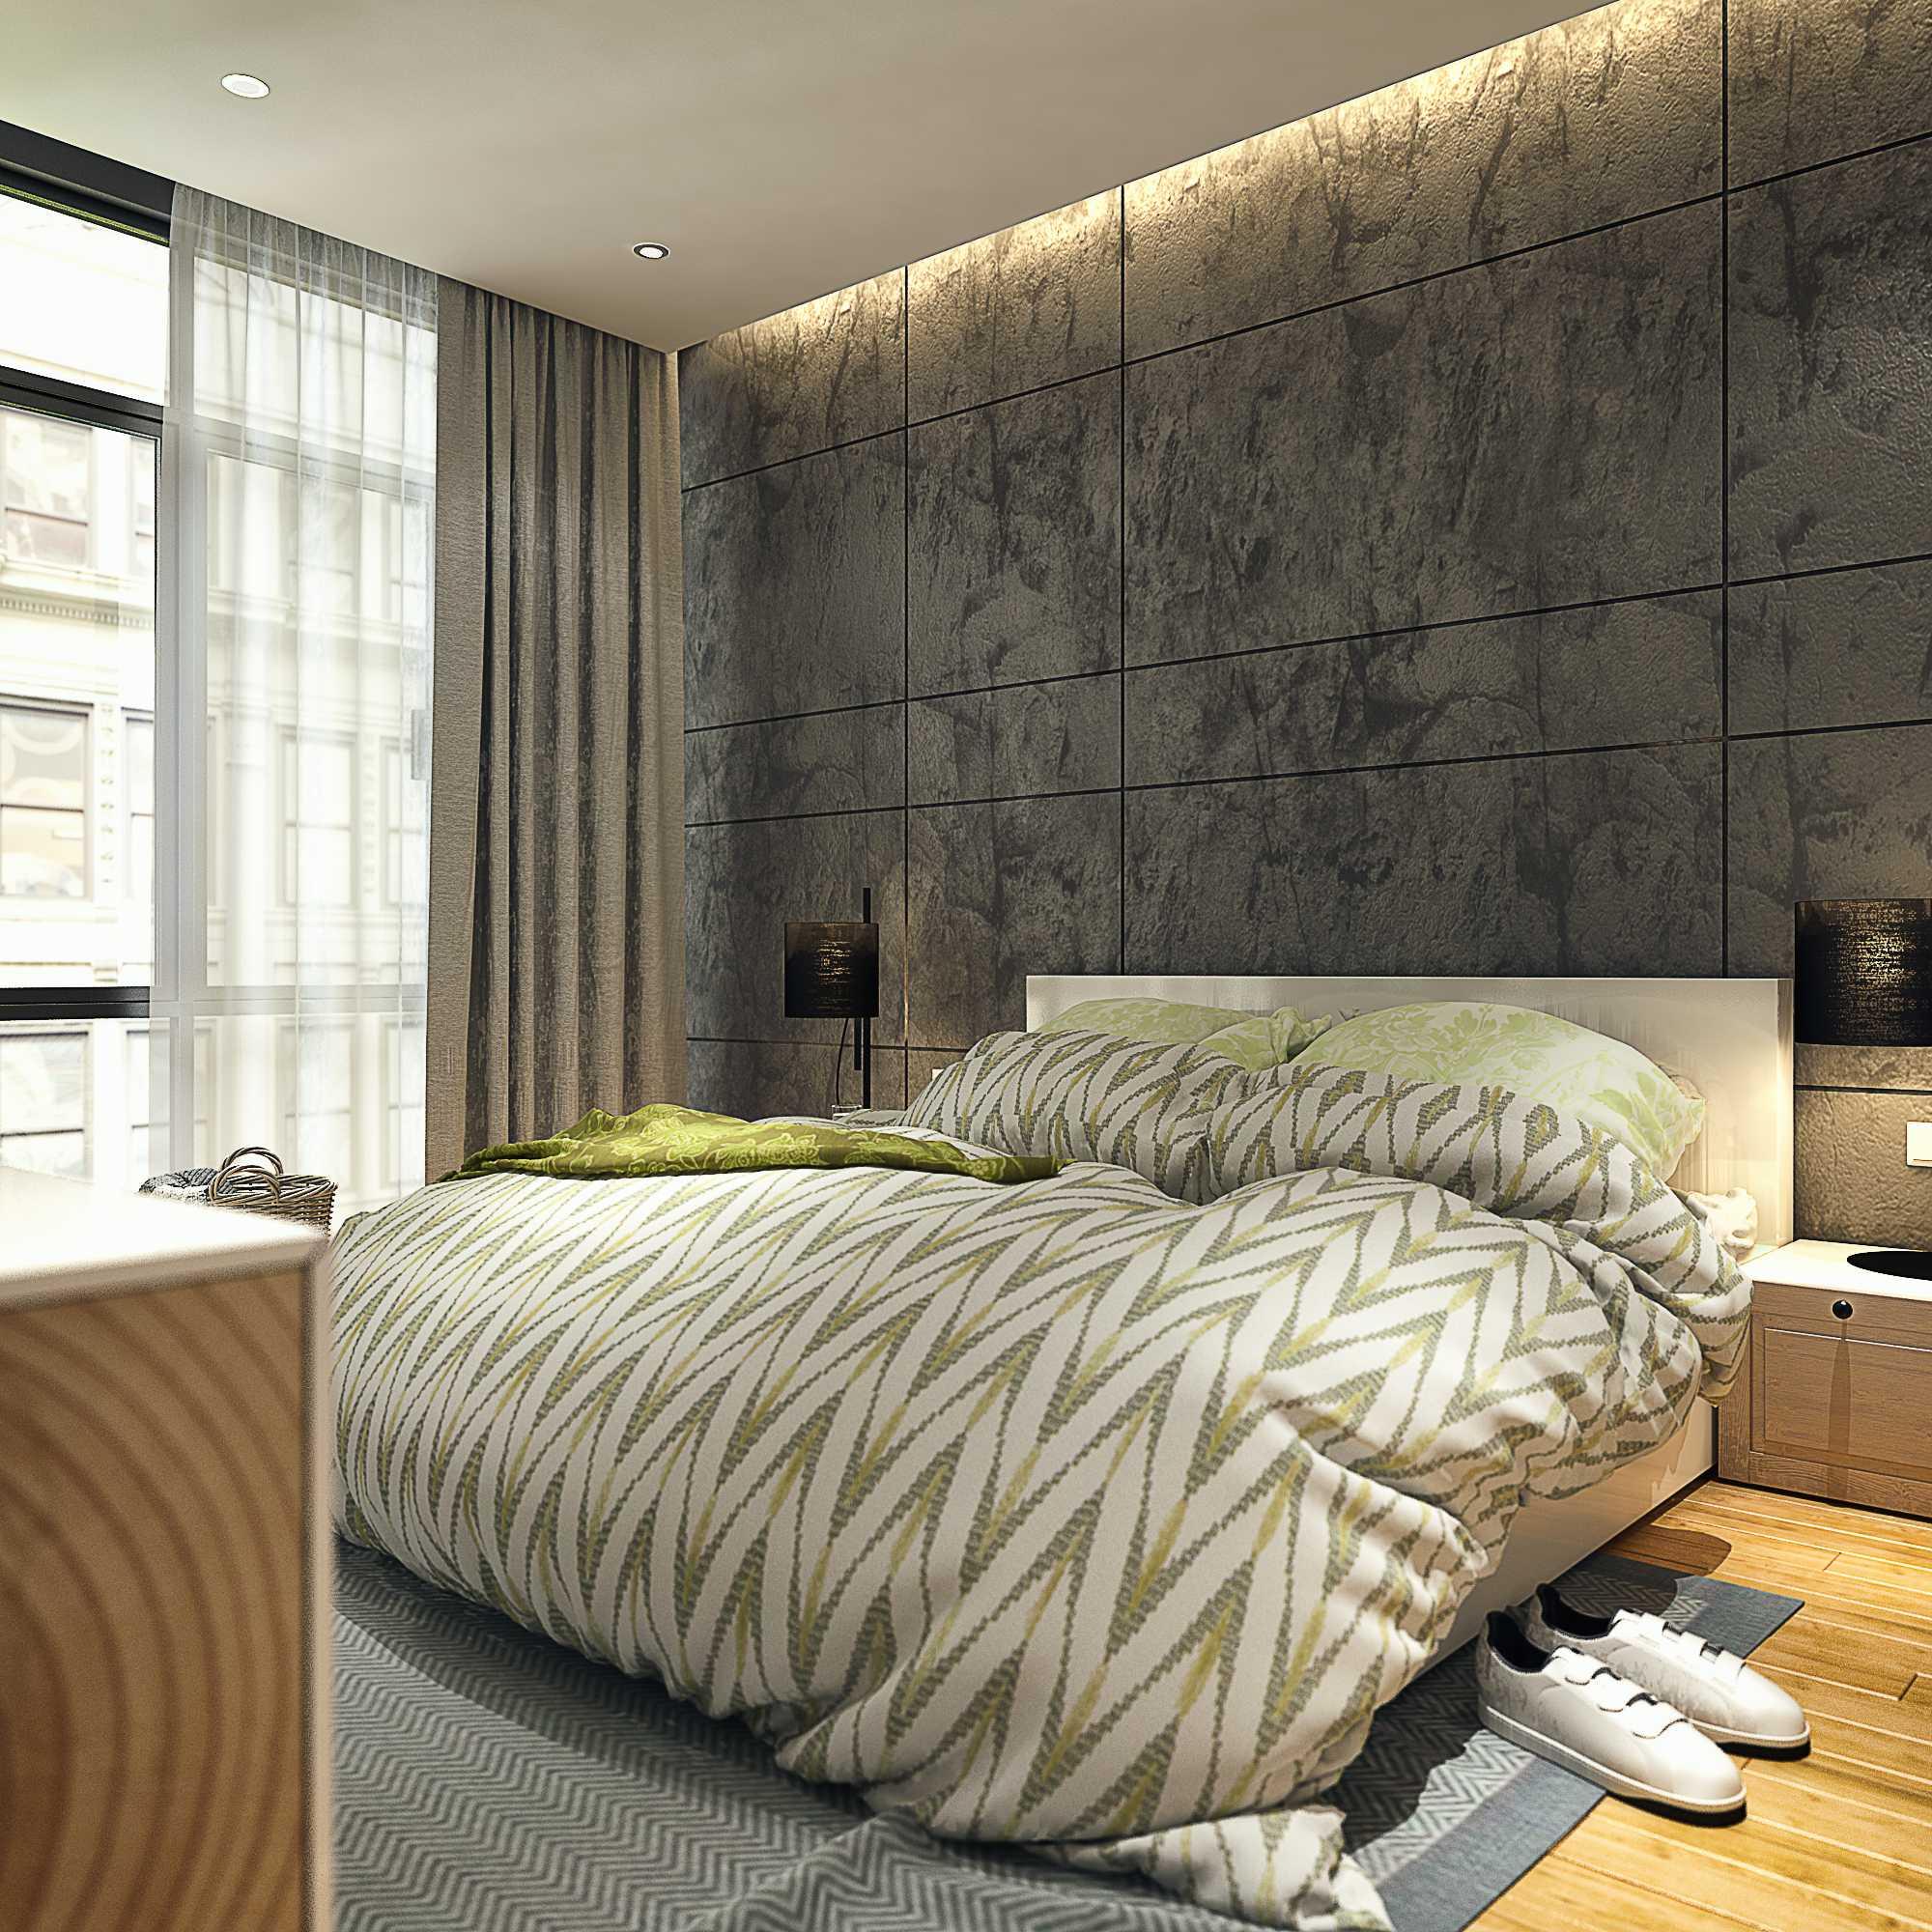 Wahyu Endra Pranata Modern Bedroom Indonesia Indonesia 1   44290